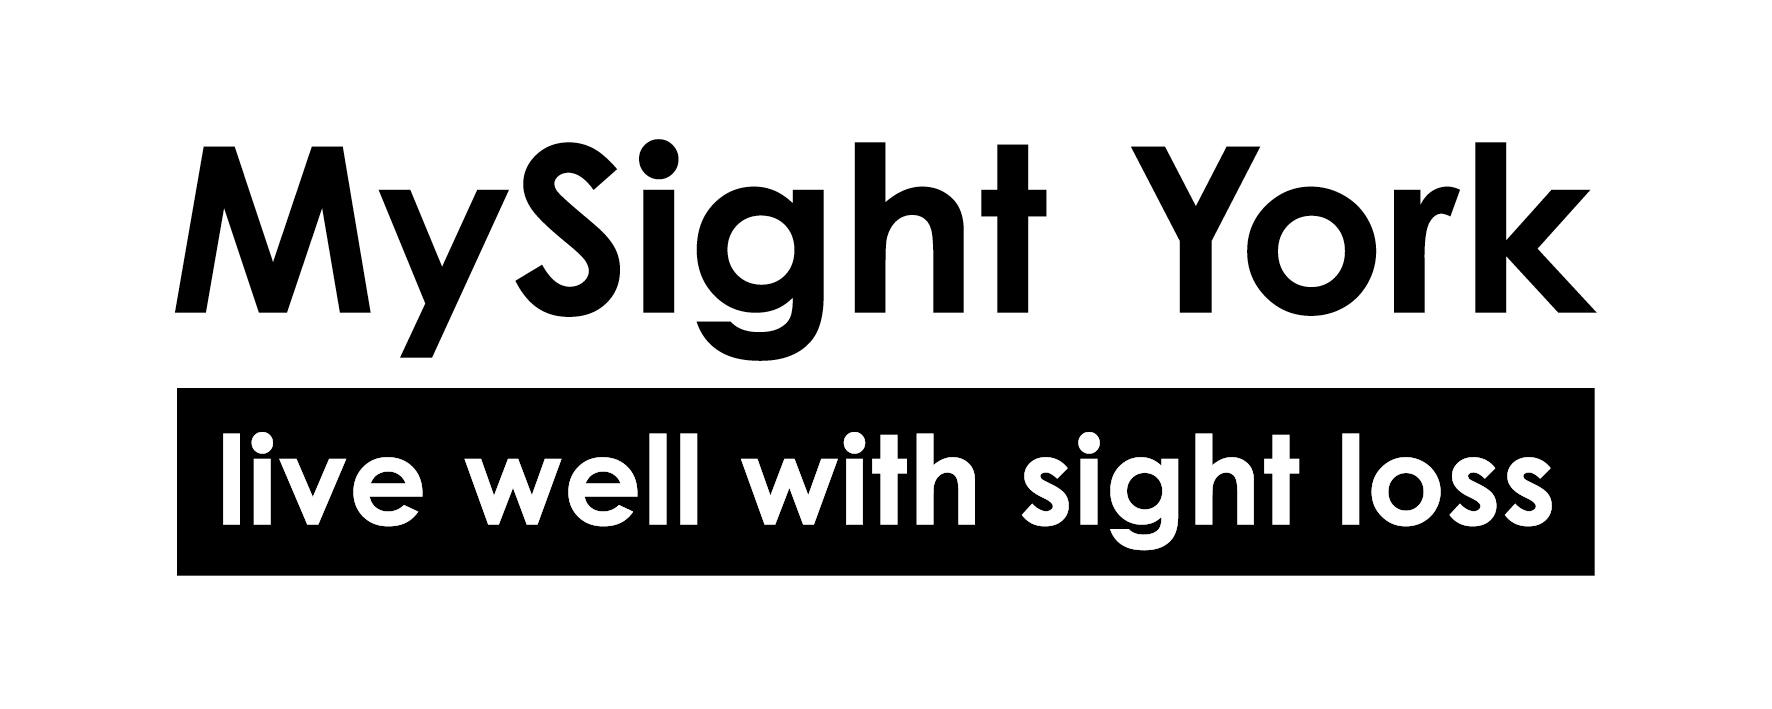 MySight York logo.jpg